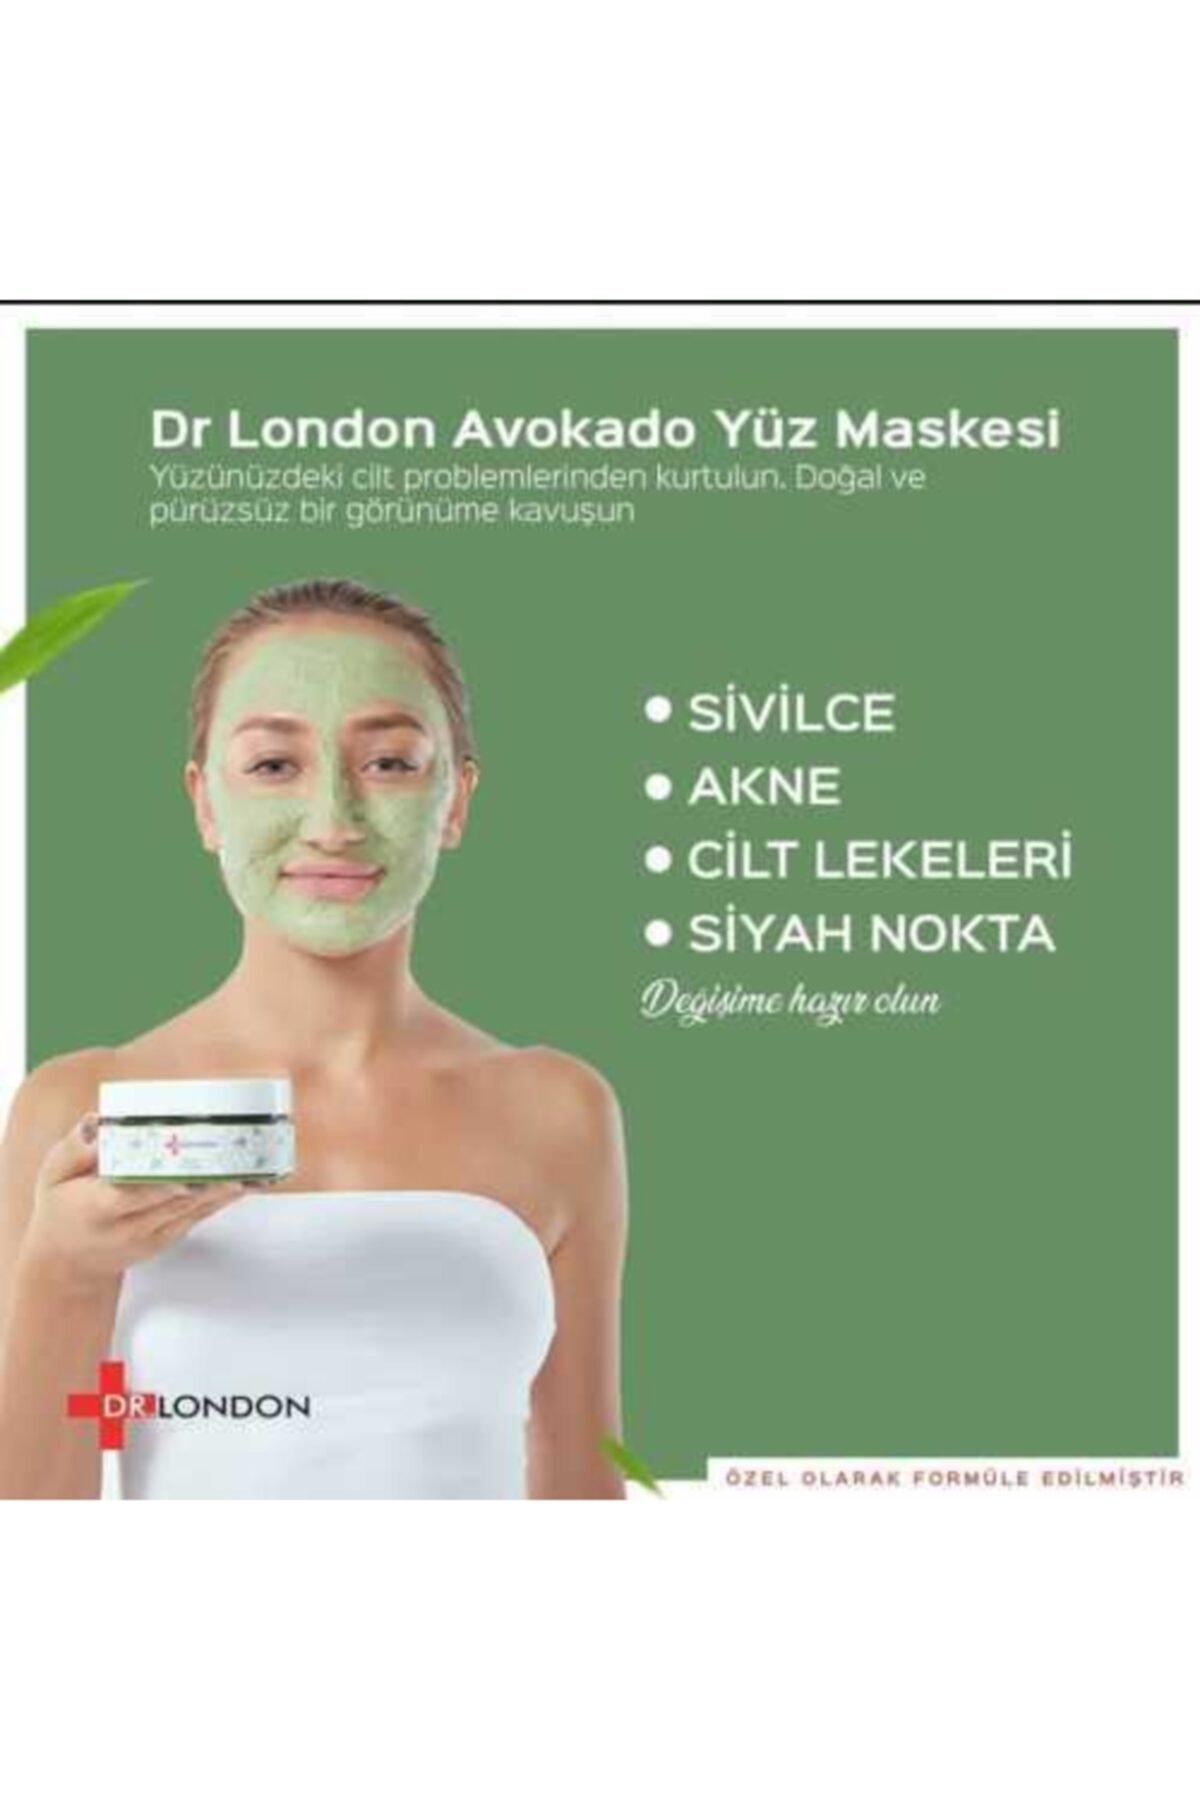 DrLondon Dr.London Avokado Maskesi 3 Kutu 2